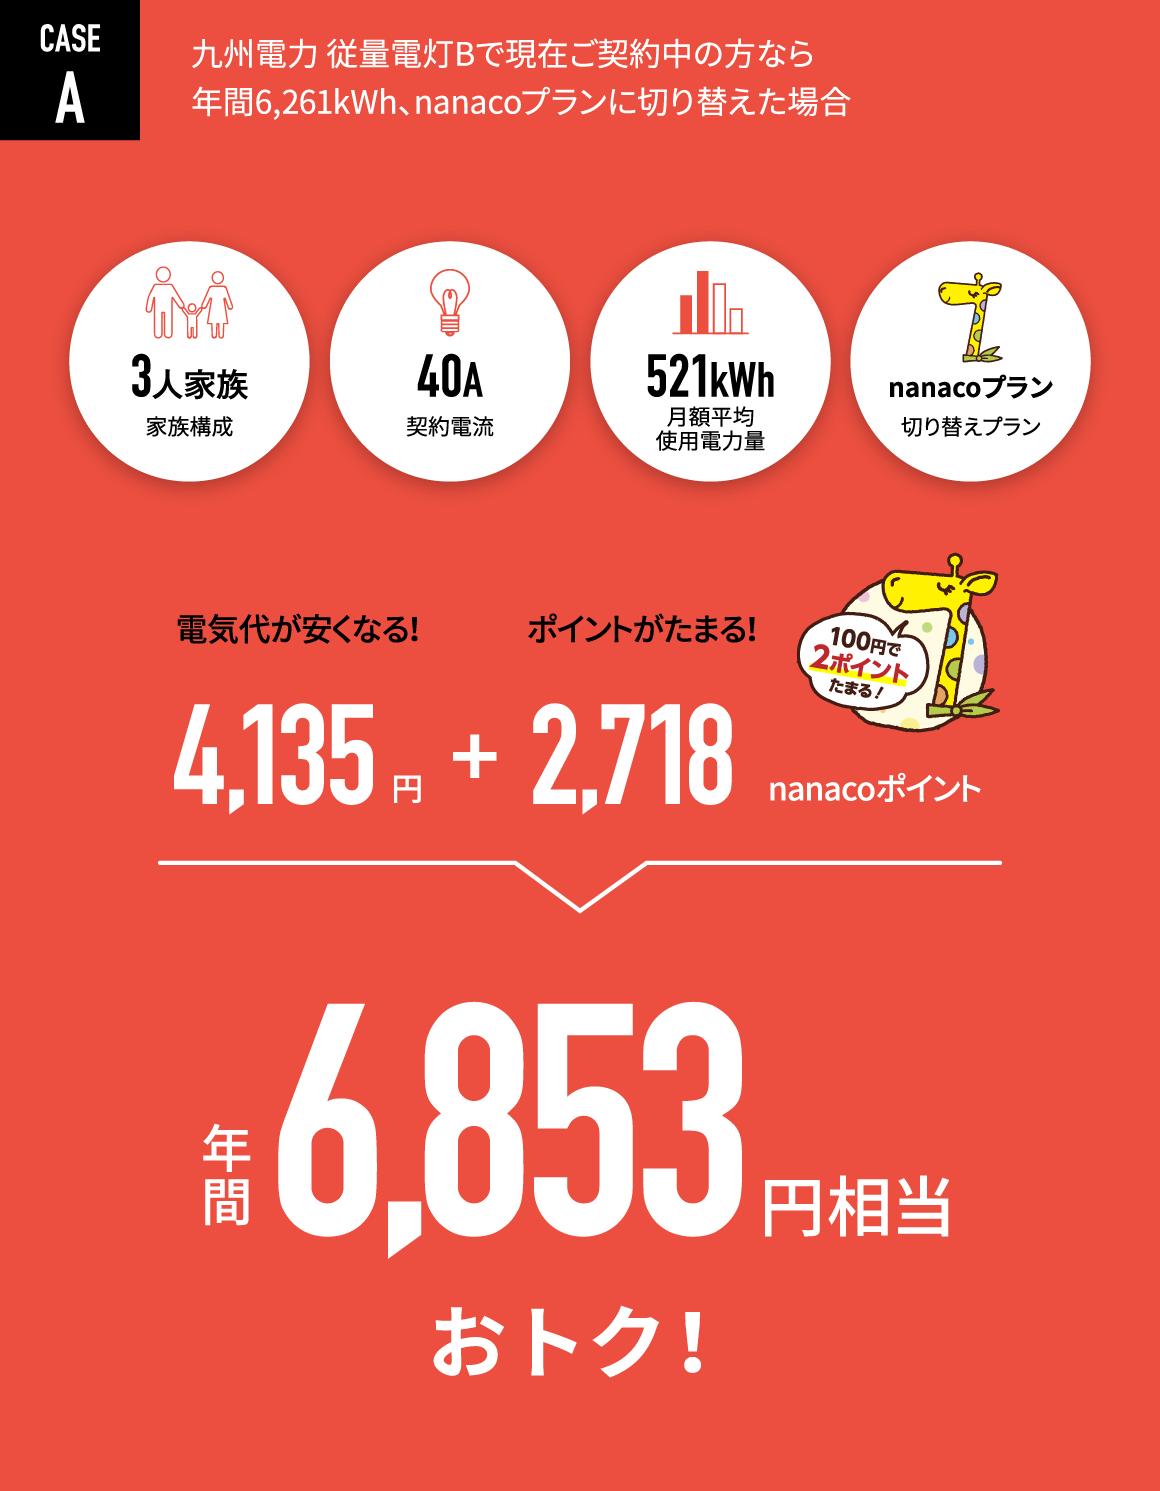 CASE A:九州電力 従量電灯Bで現在ご契約中の方なら、年間6,261kWh、nanacoプランに切り替えた場合、年間6,853円相当おトク!